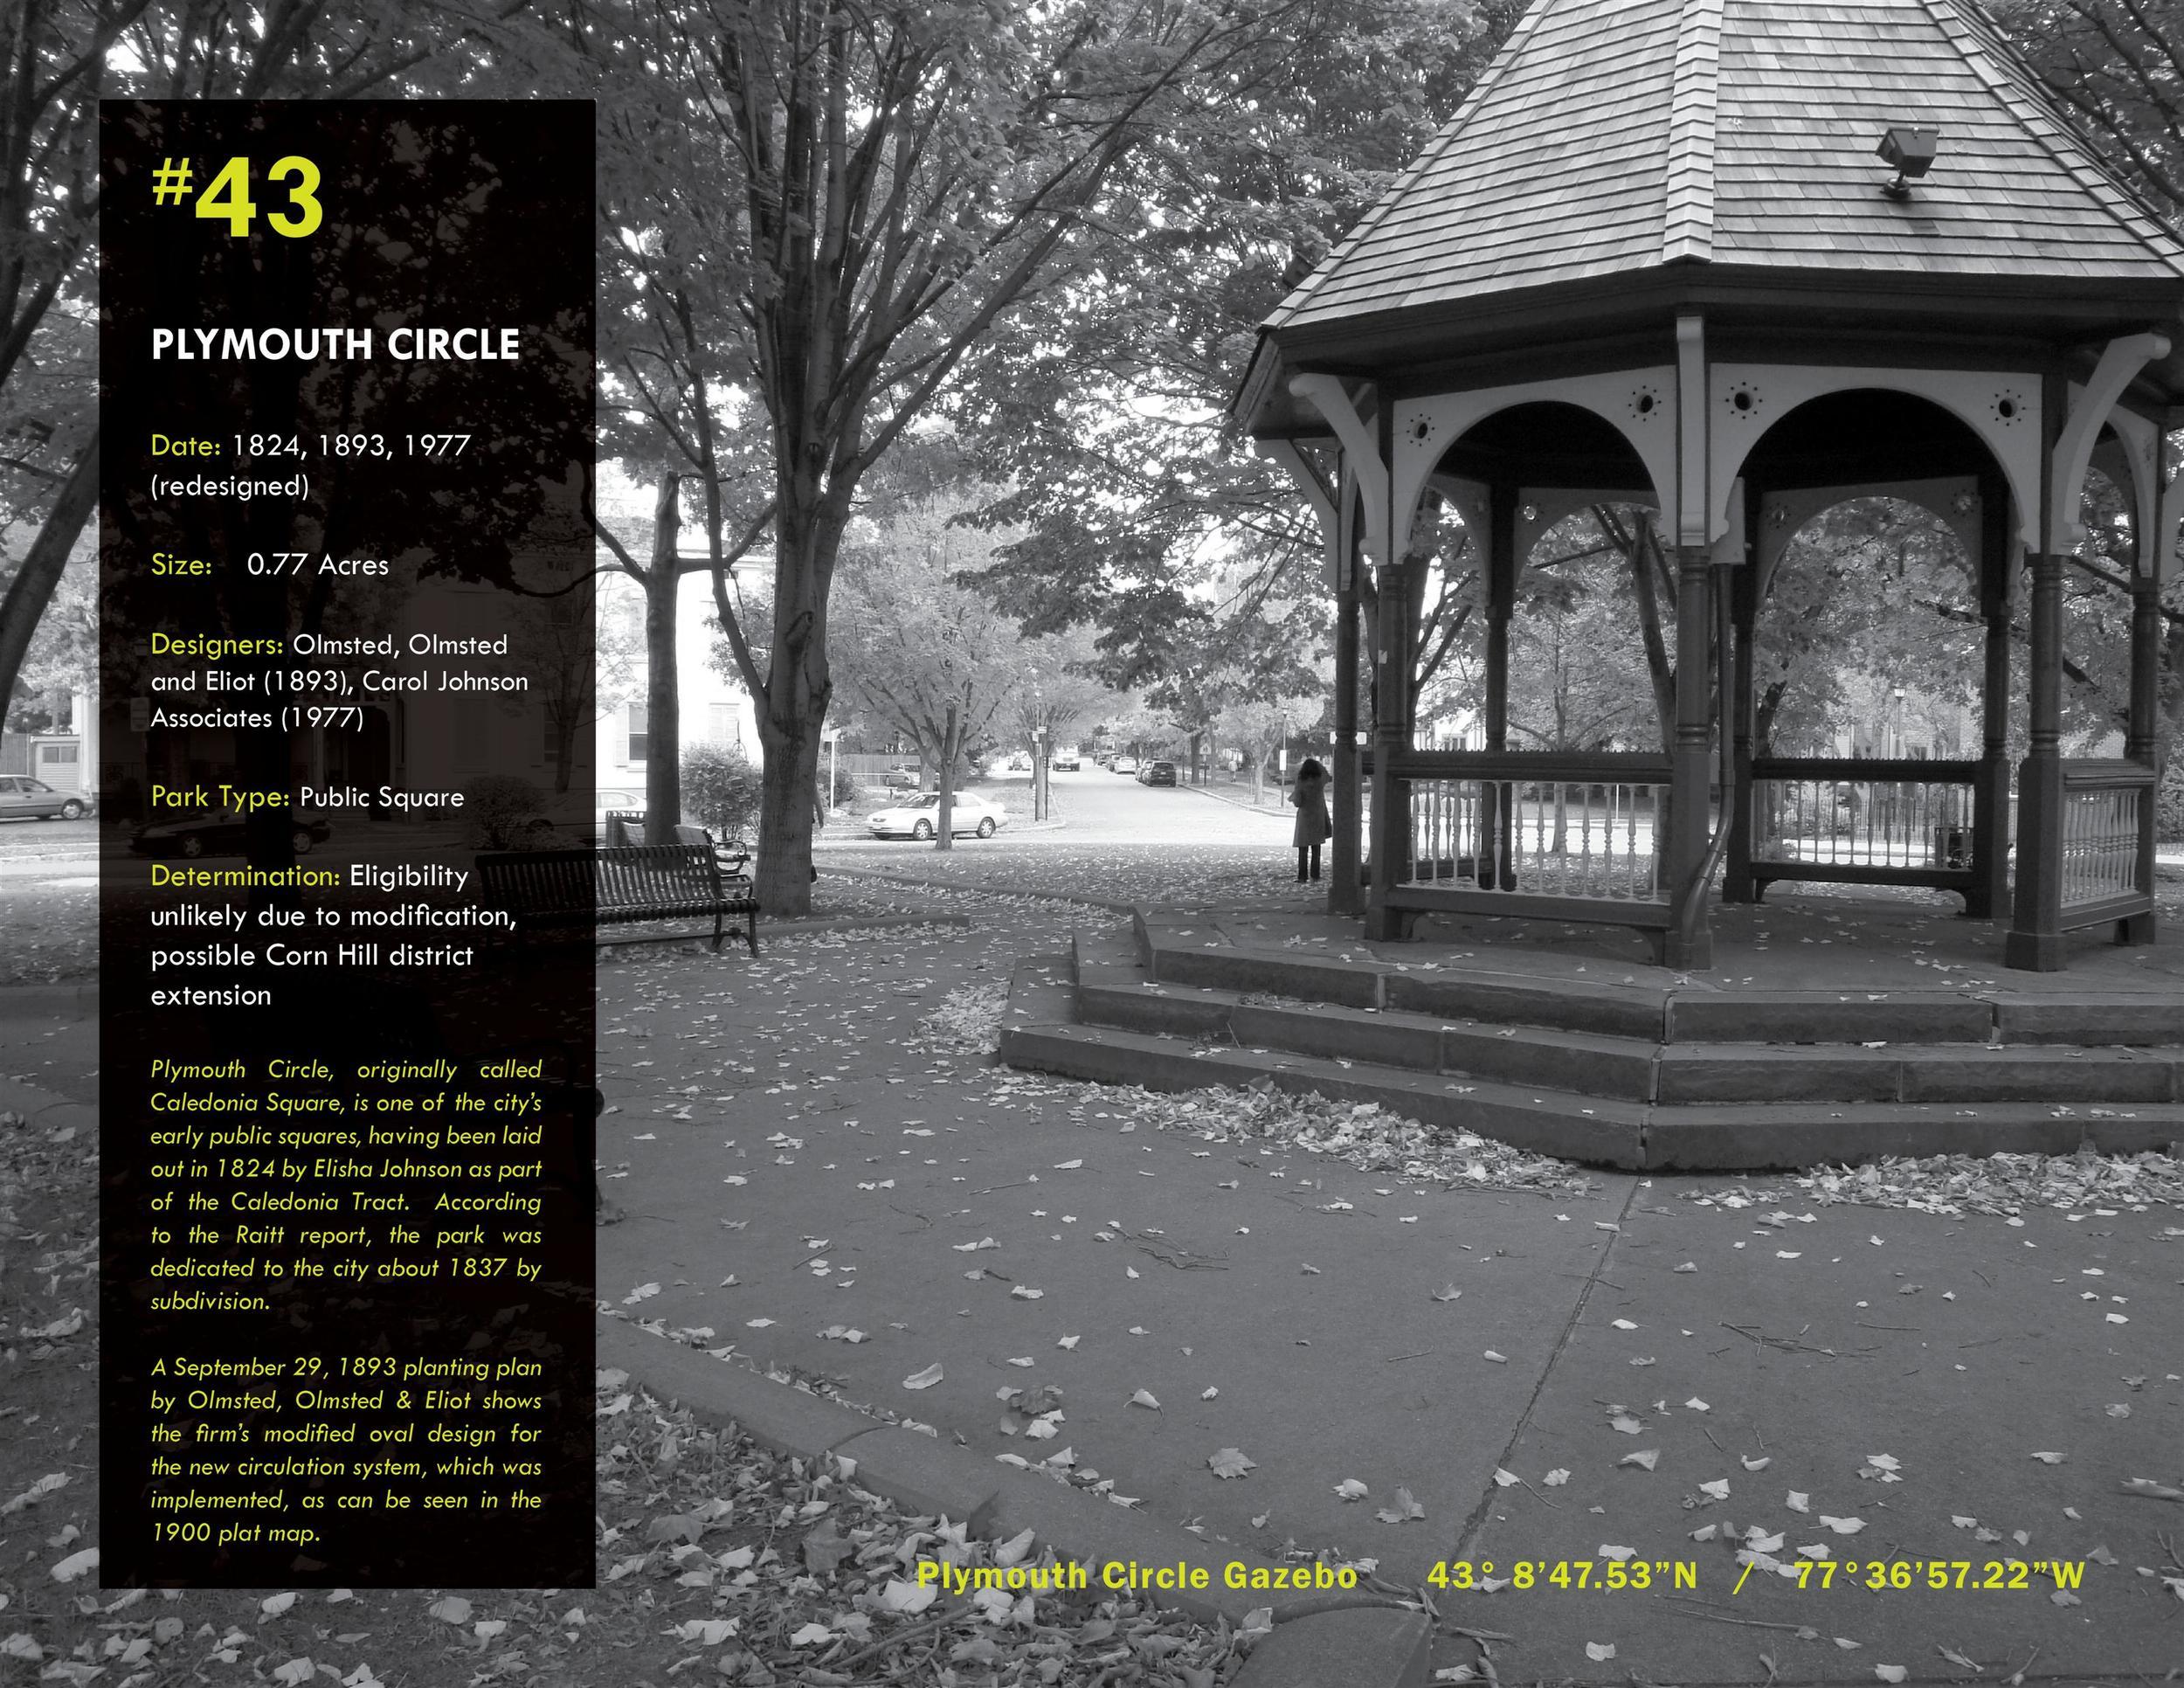 355-12 plymouth site43 (Custom).jpg